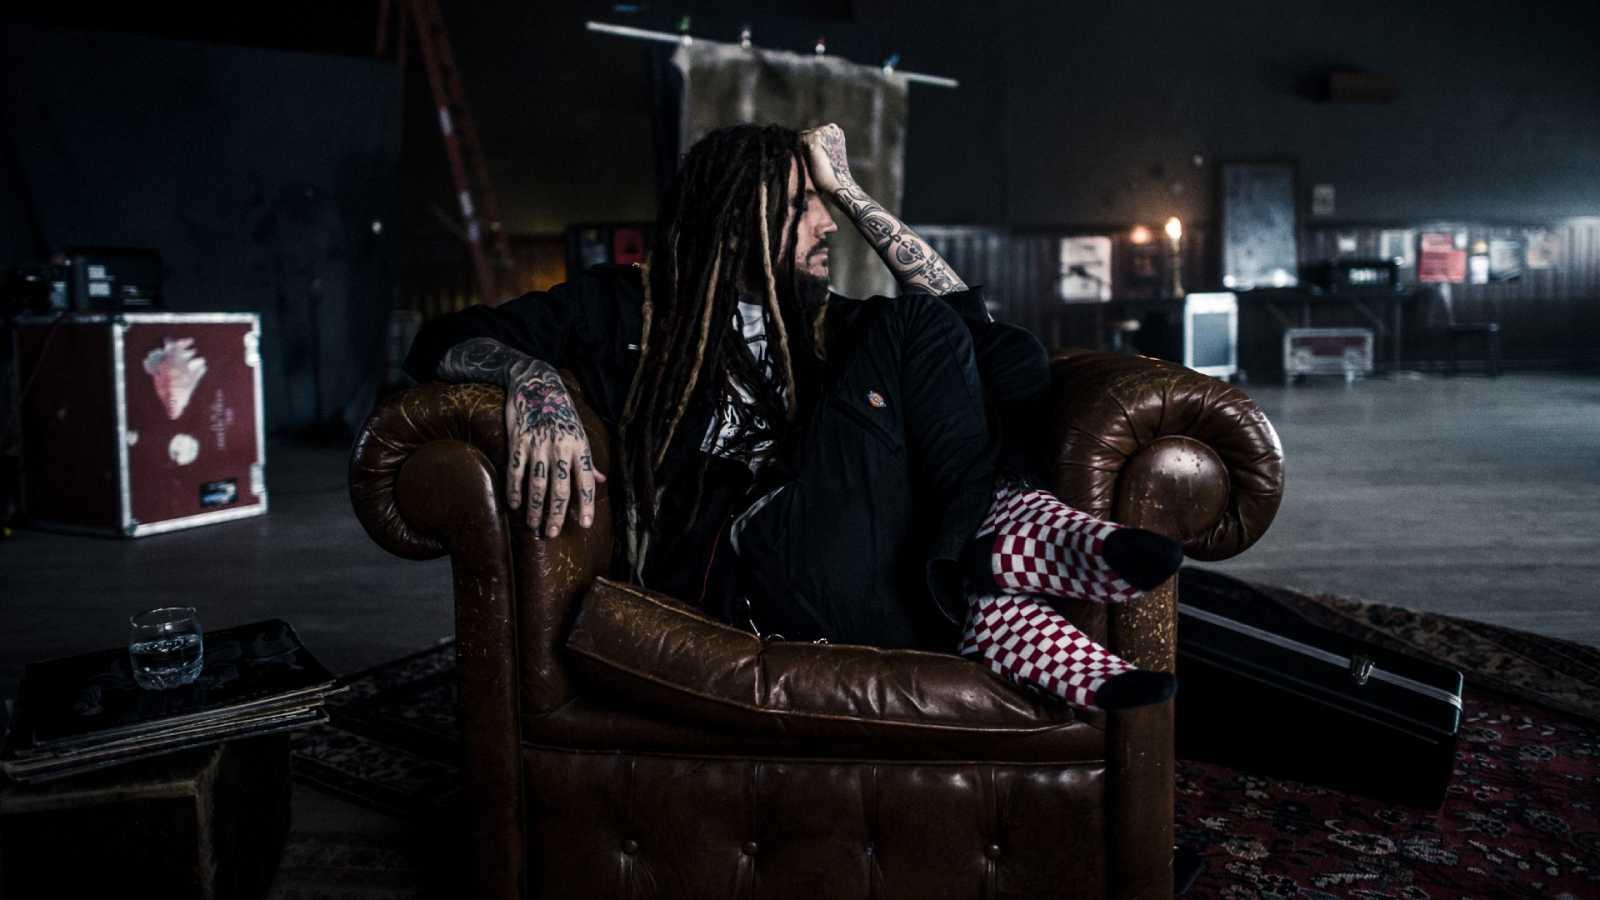 El vuelo del Fénix - Entrevista Brian Head de Korn - 30/04/20 - escuchar ahora